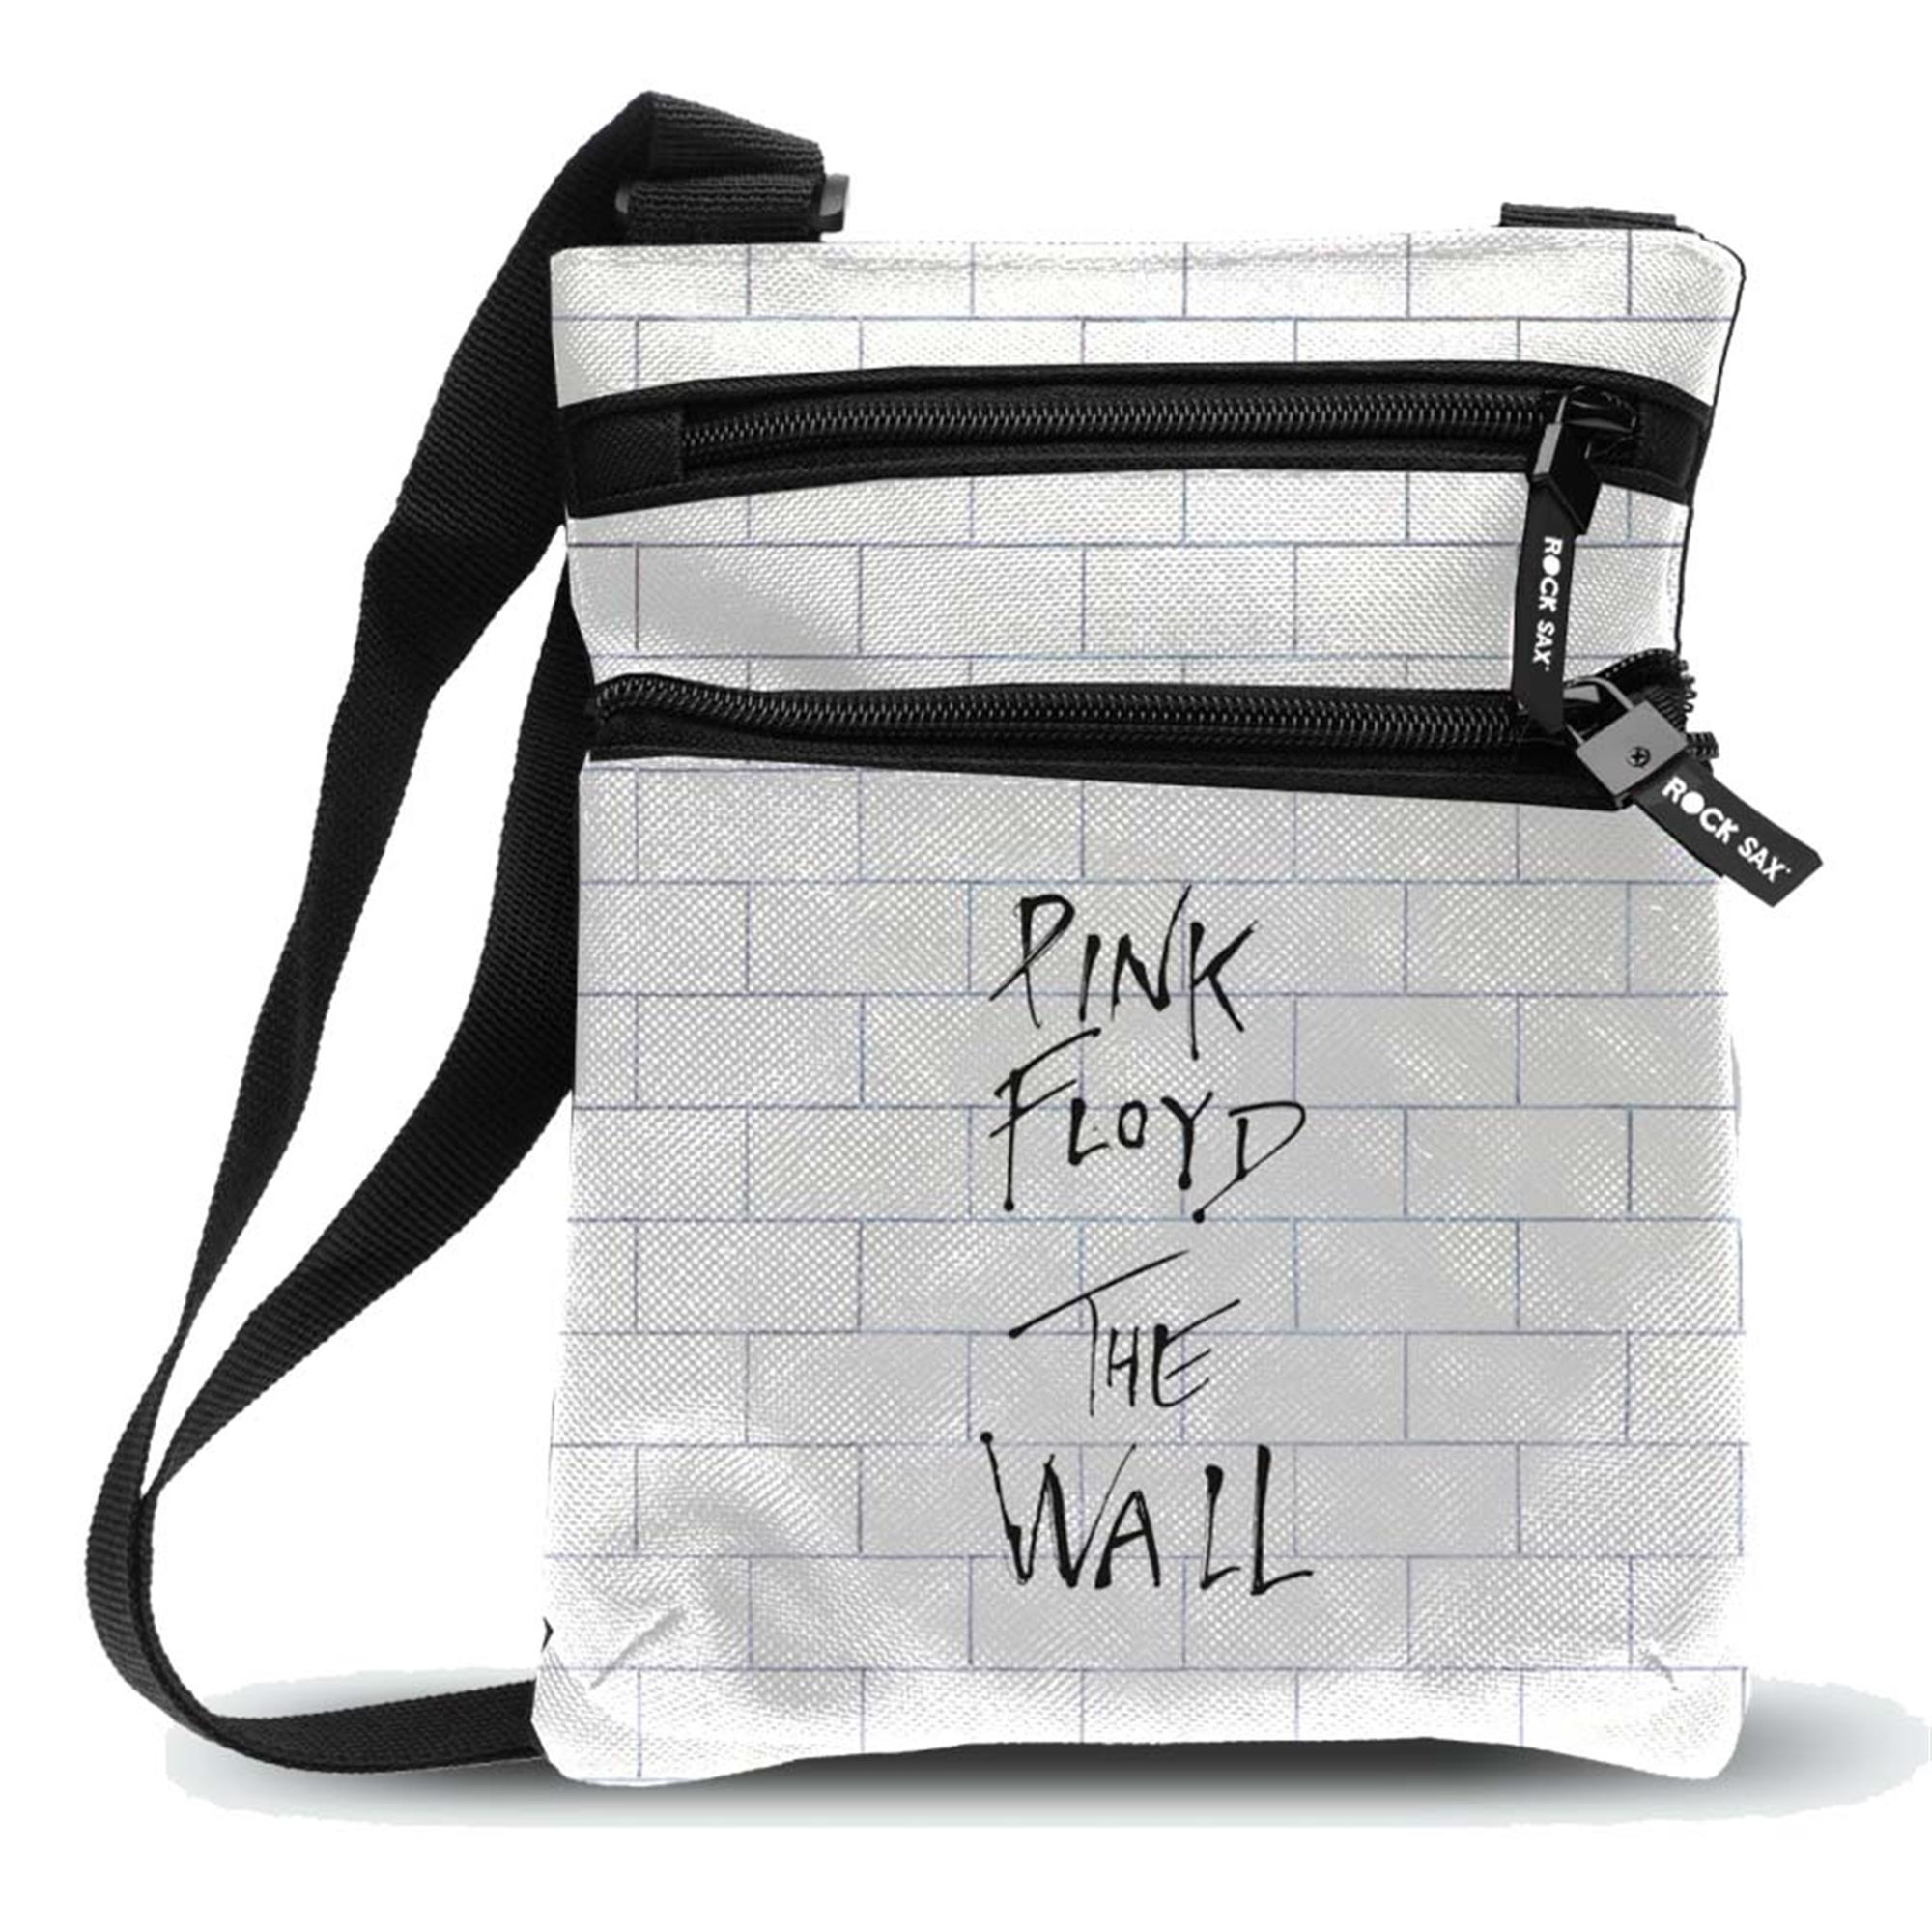 Pink Floyd The Wall Body Bag